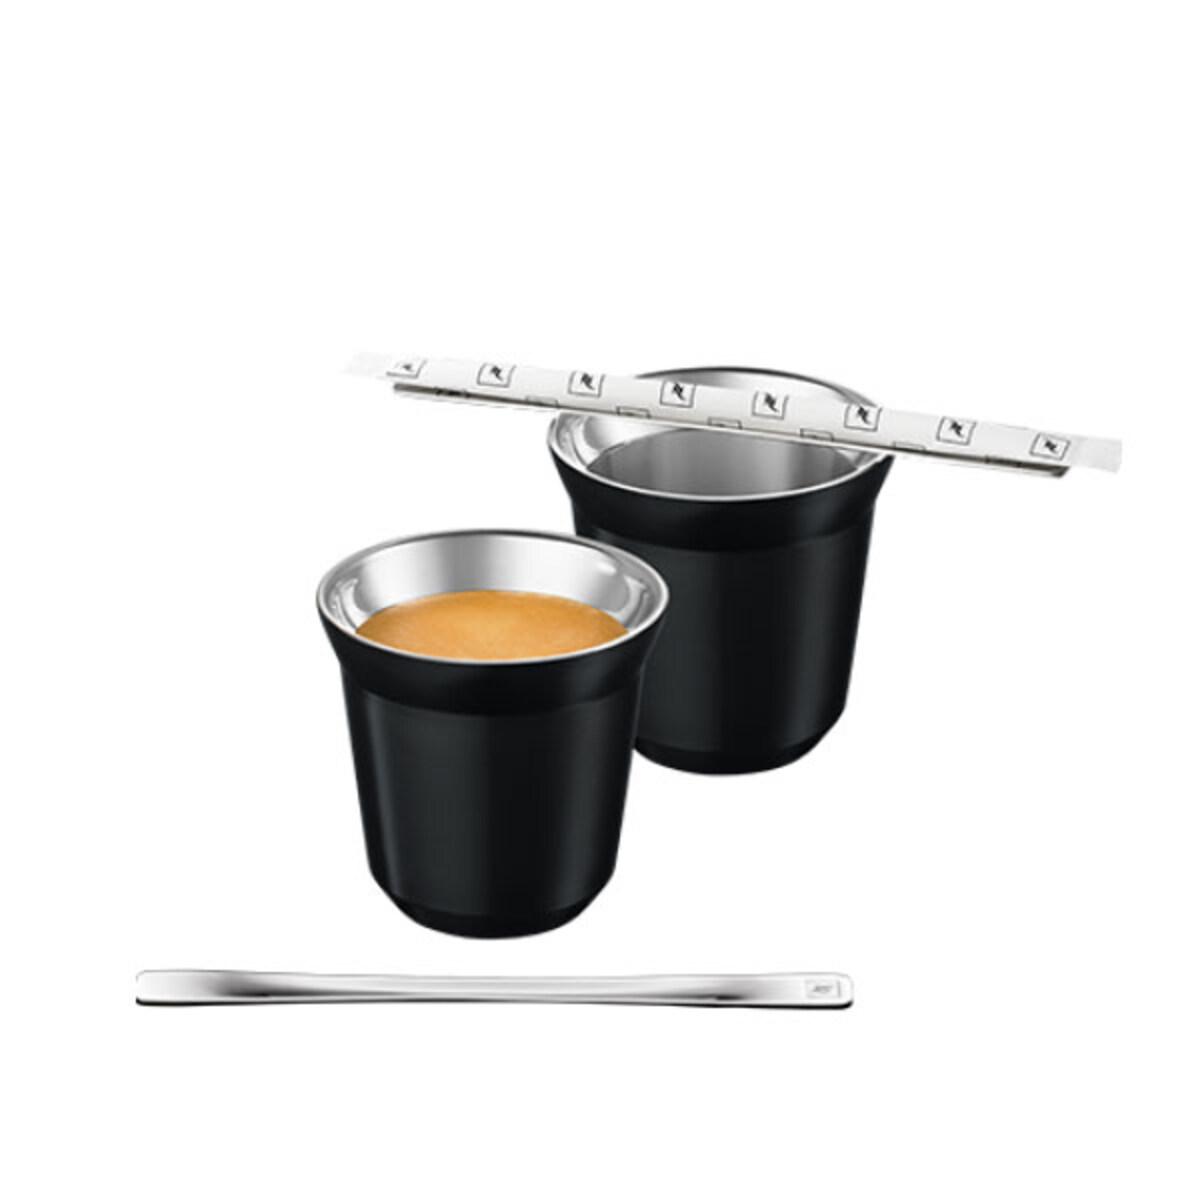 Nespresso чаши Pixie Espresso Ristretto